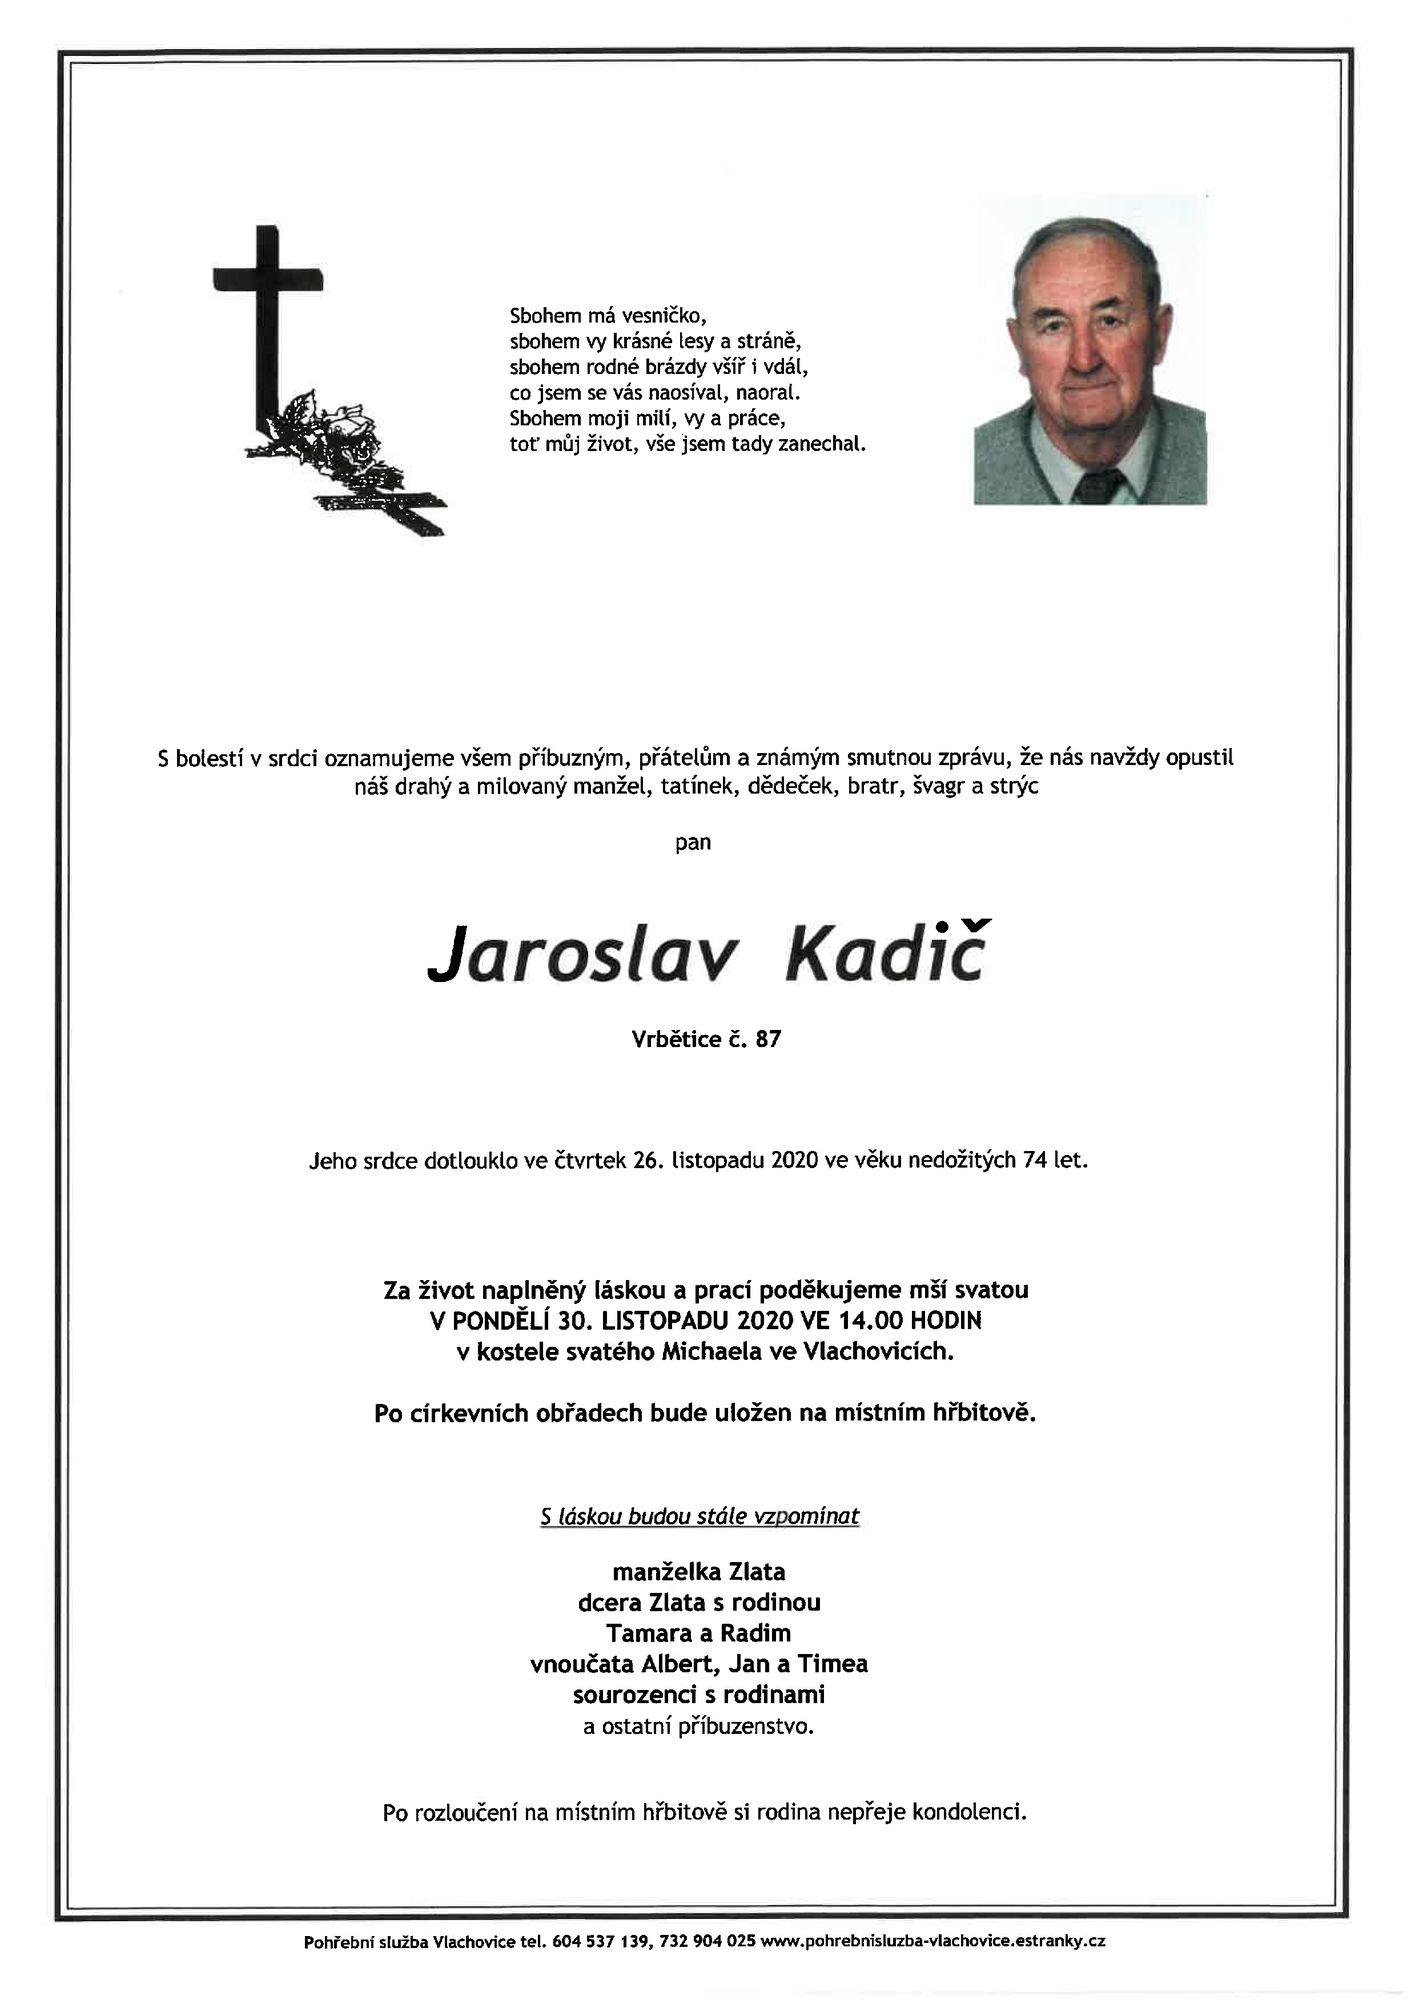 Jaroslav Kadič